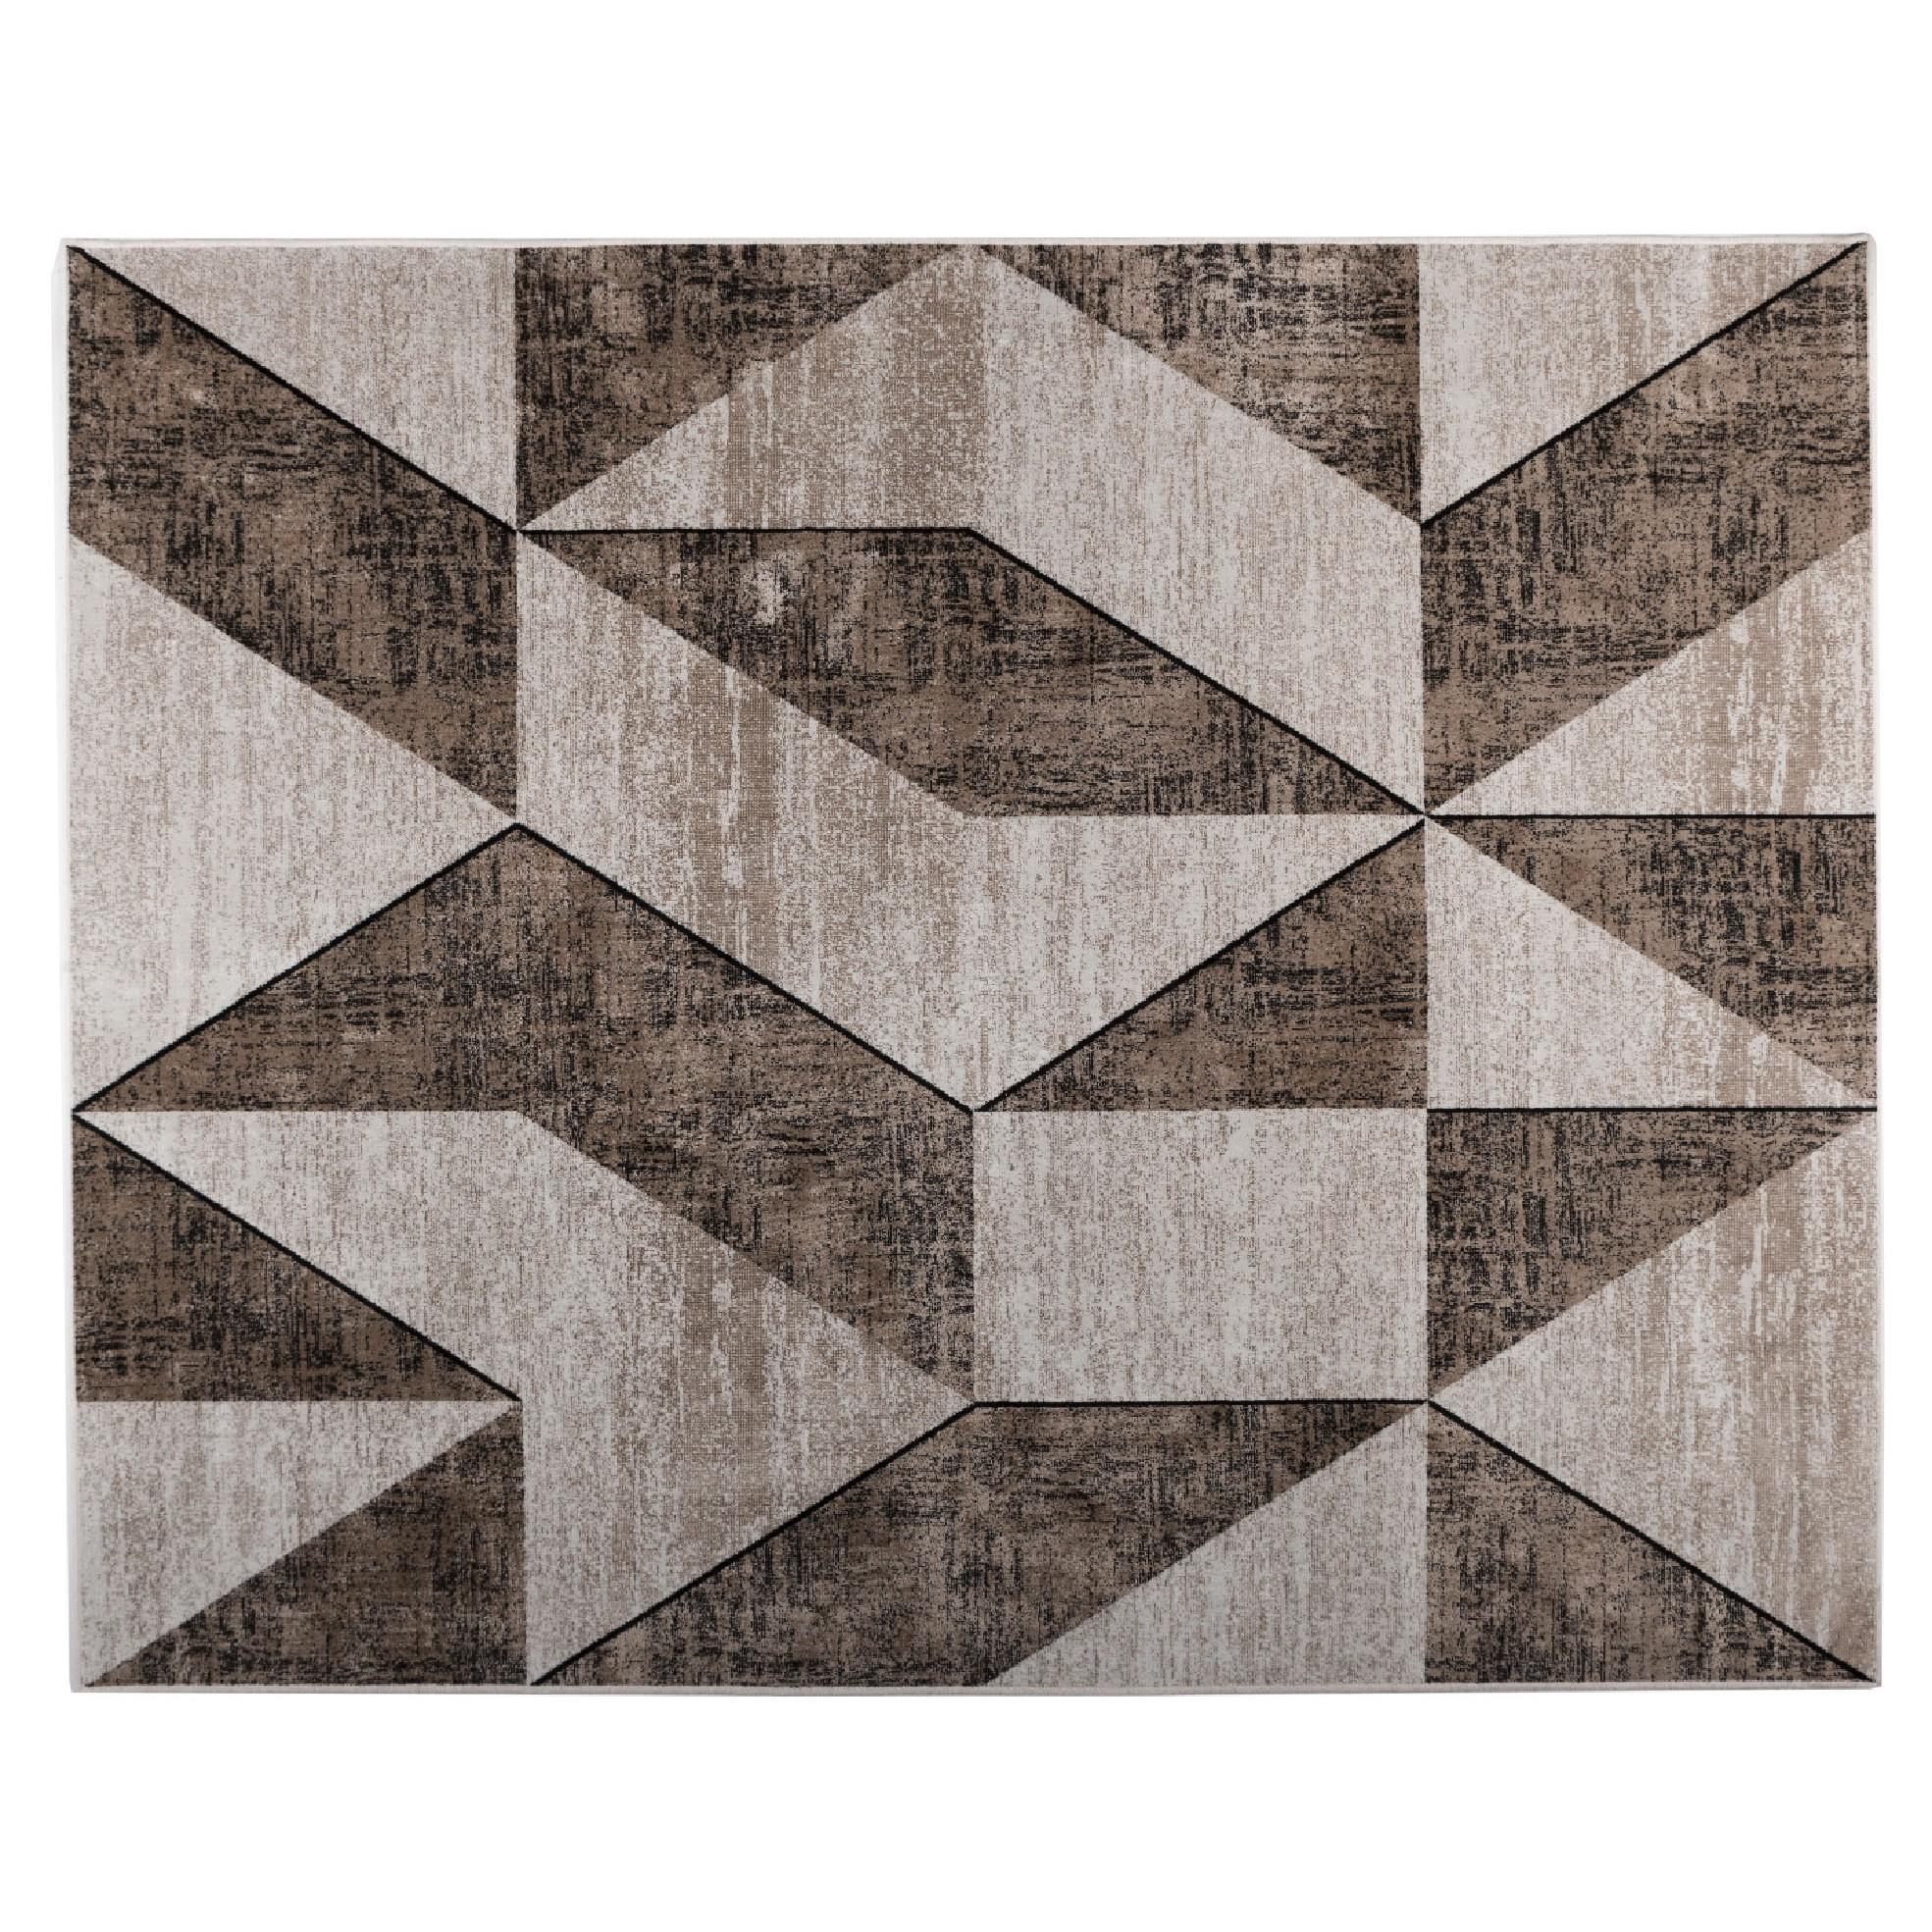 Tapete de Tecido Retangular 100x140cm Belga - Fatex